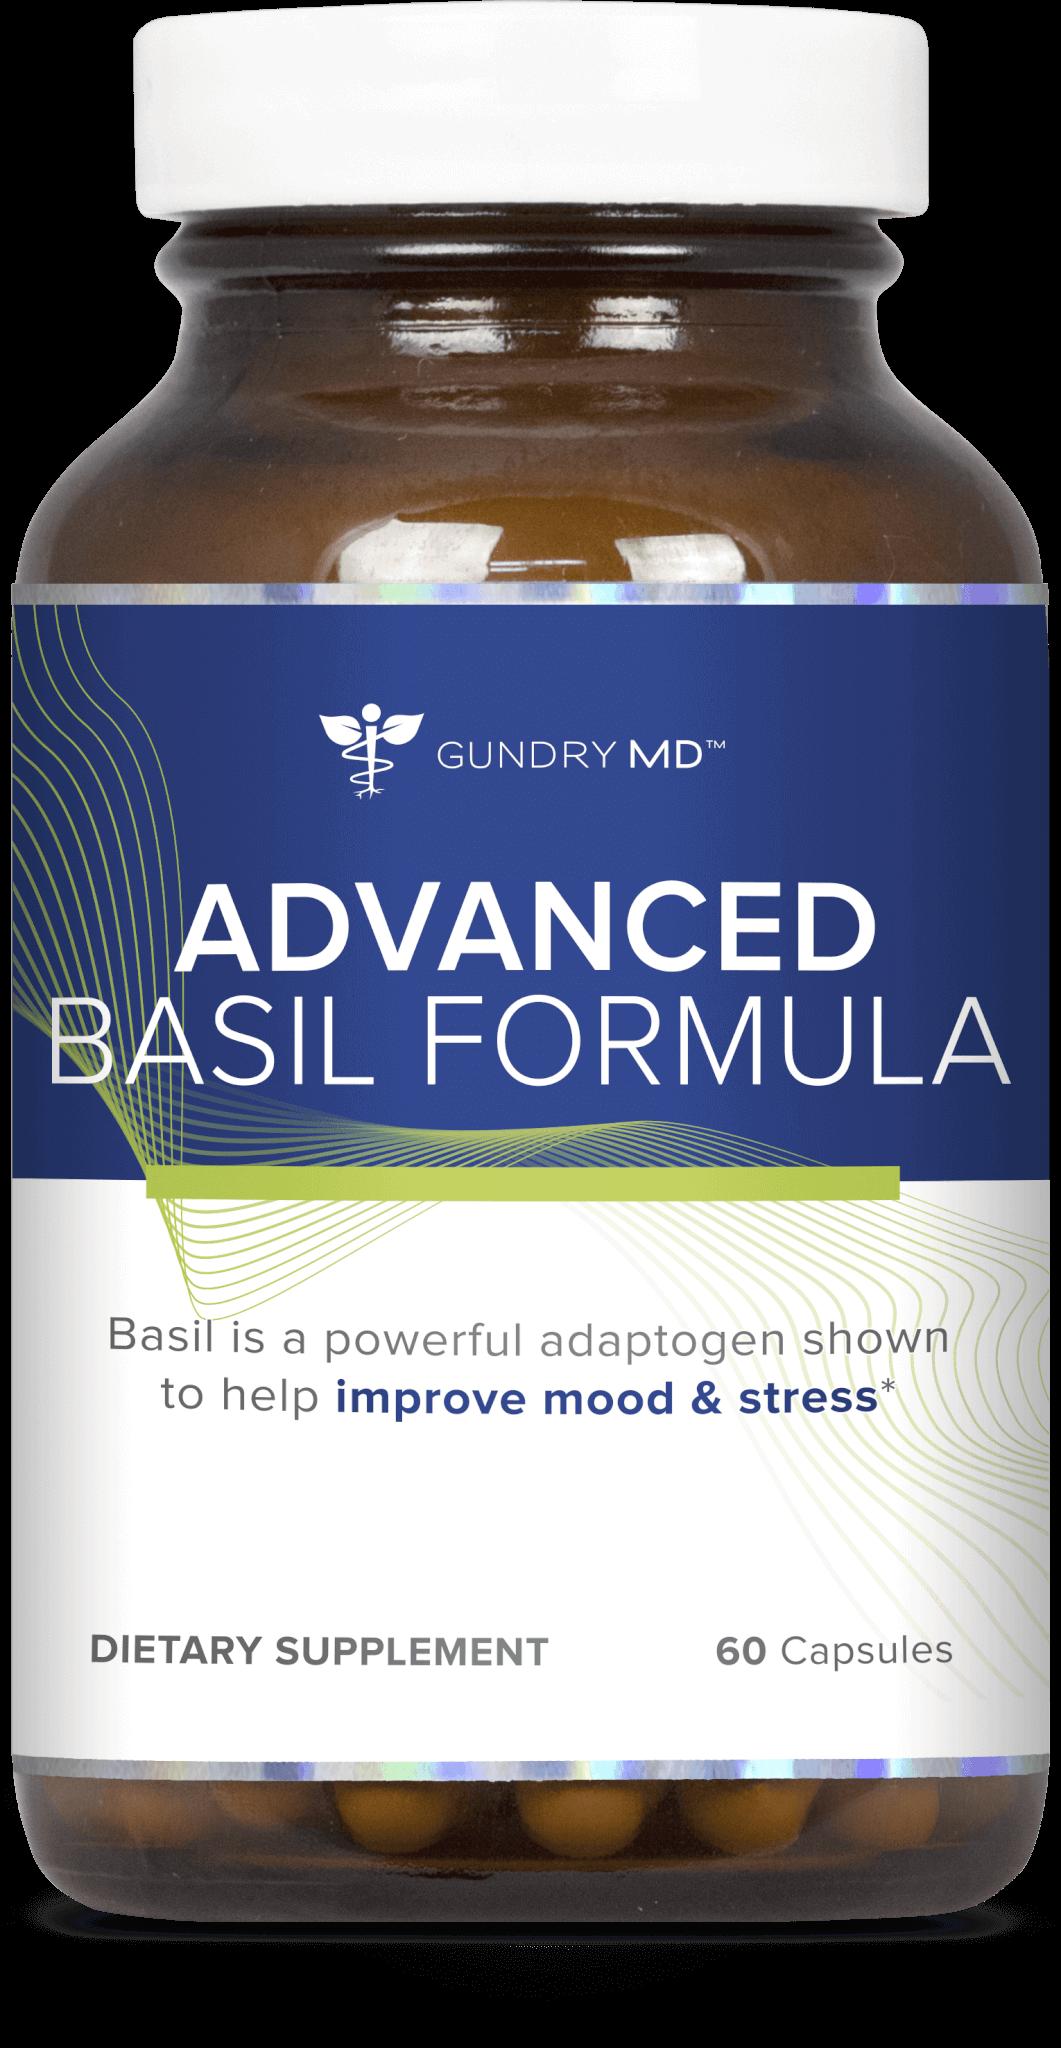 Advanced Basil Formula